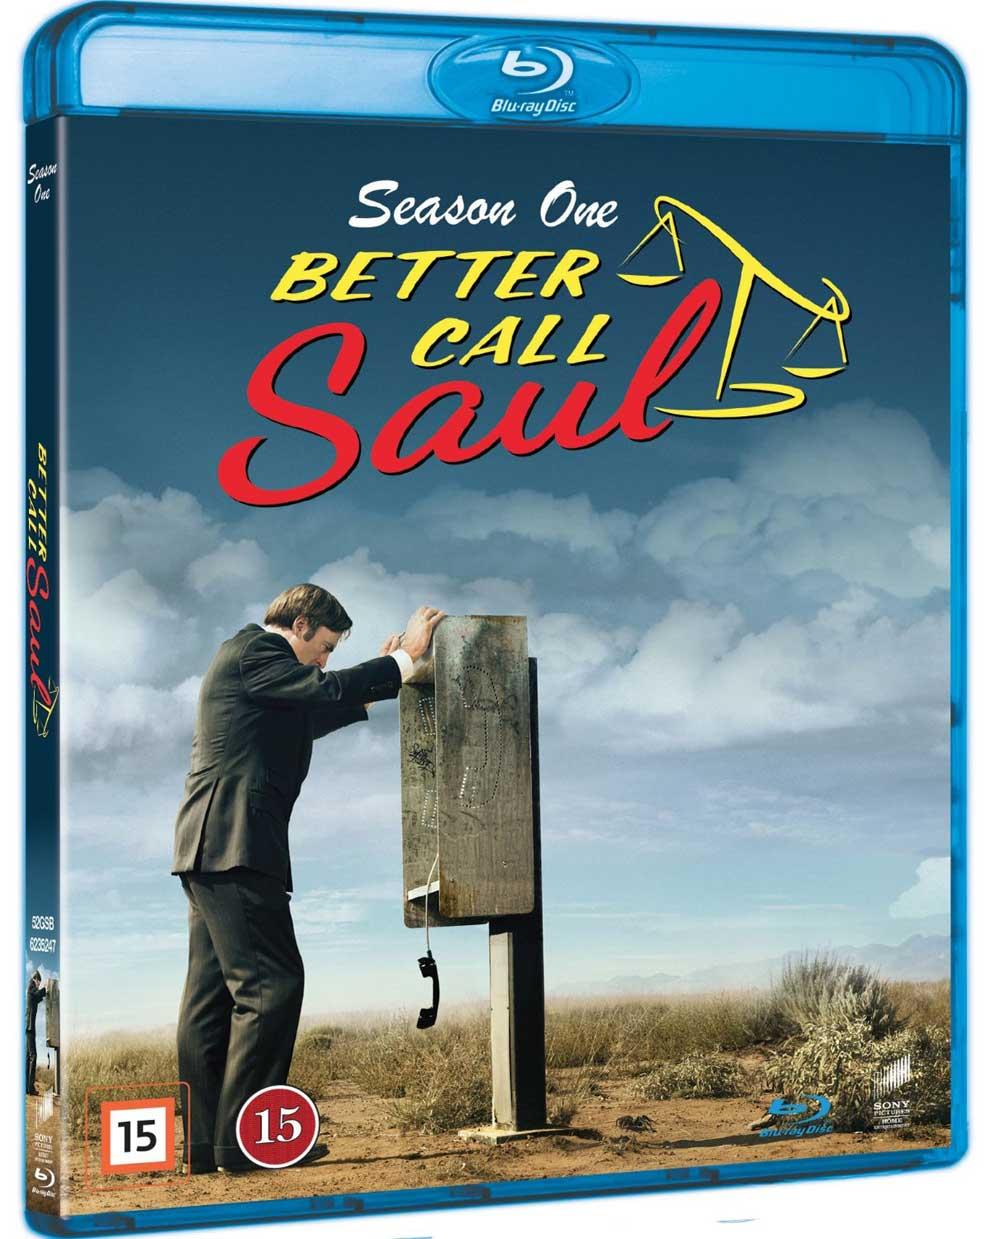 COF.BETTER CALL SAUL - STAGIONE 01 (3 BLU-RAY)